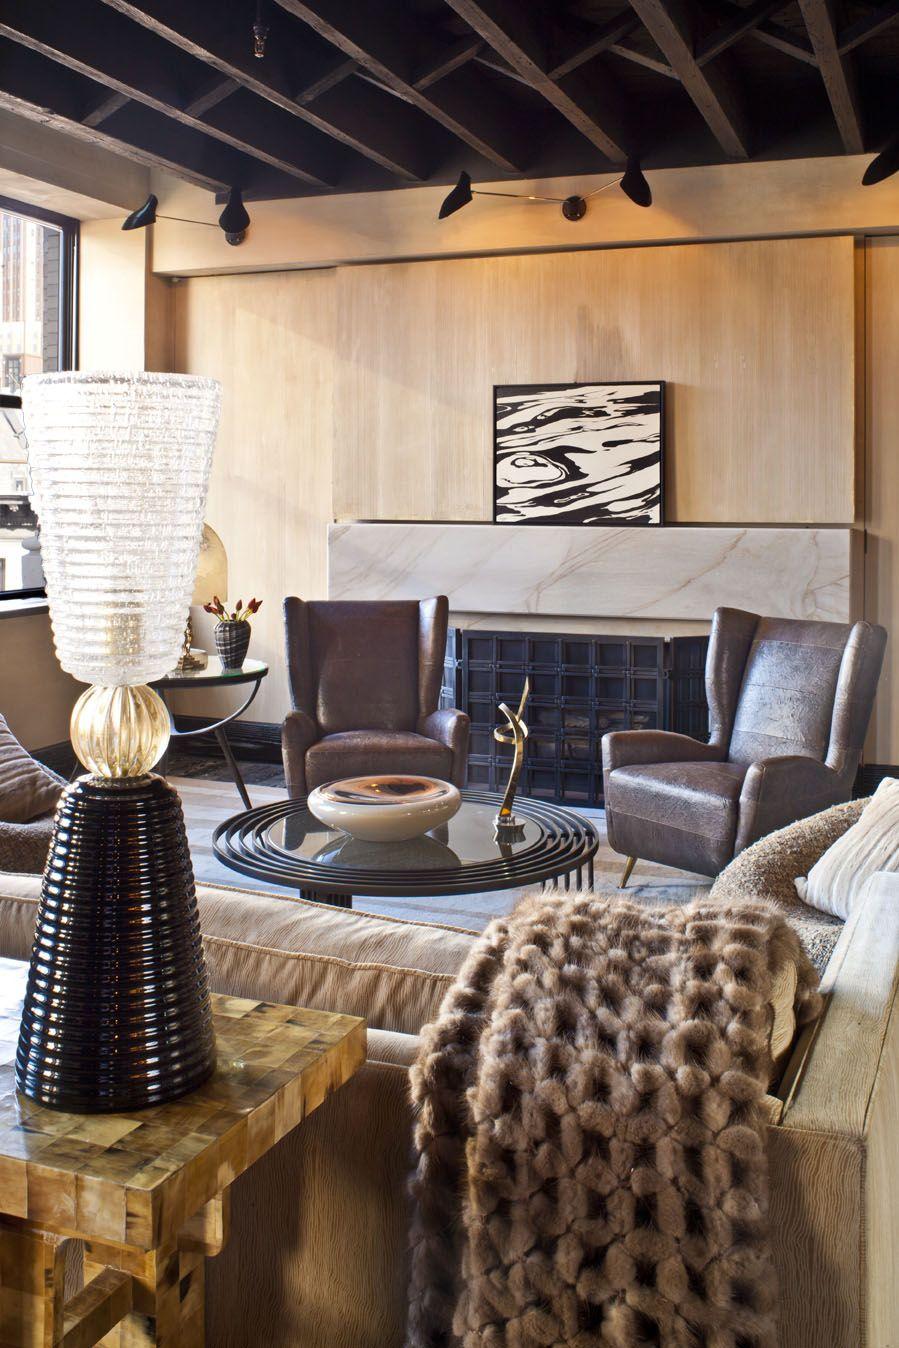 17 Minimalist Home Interior Design Ideas: Minimalist Living Room With Neutral And Masculine Furniture.